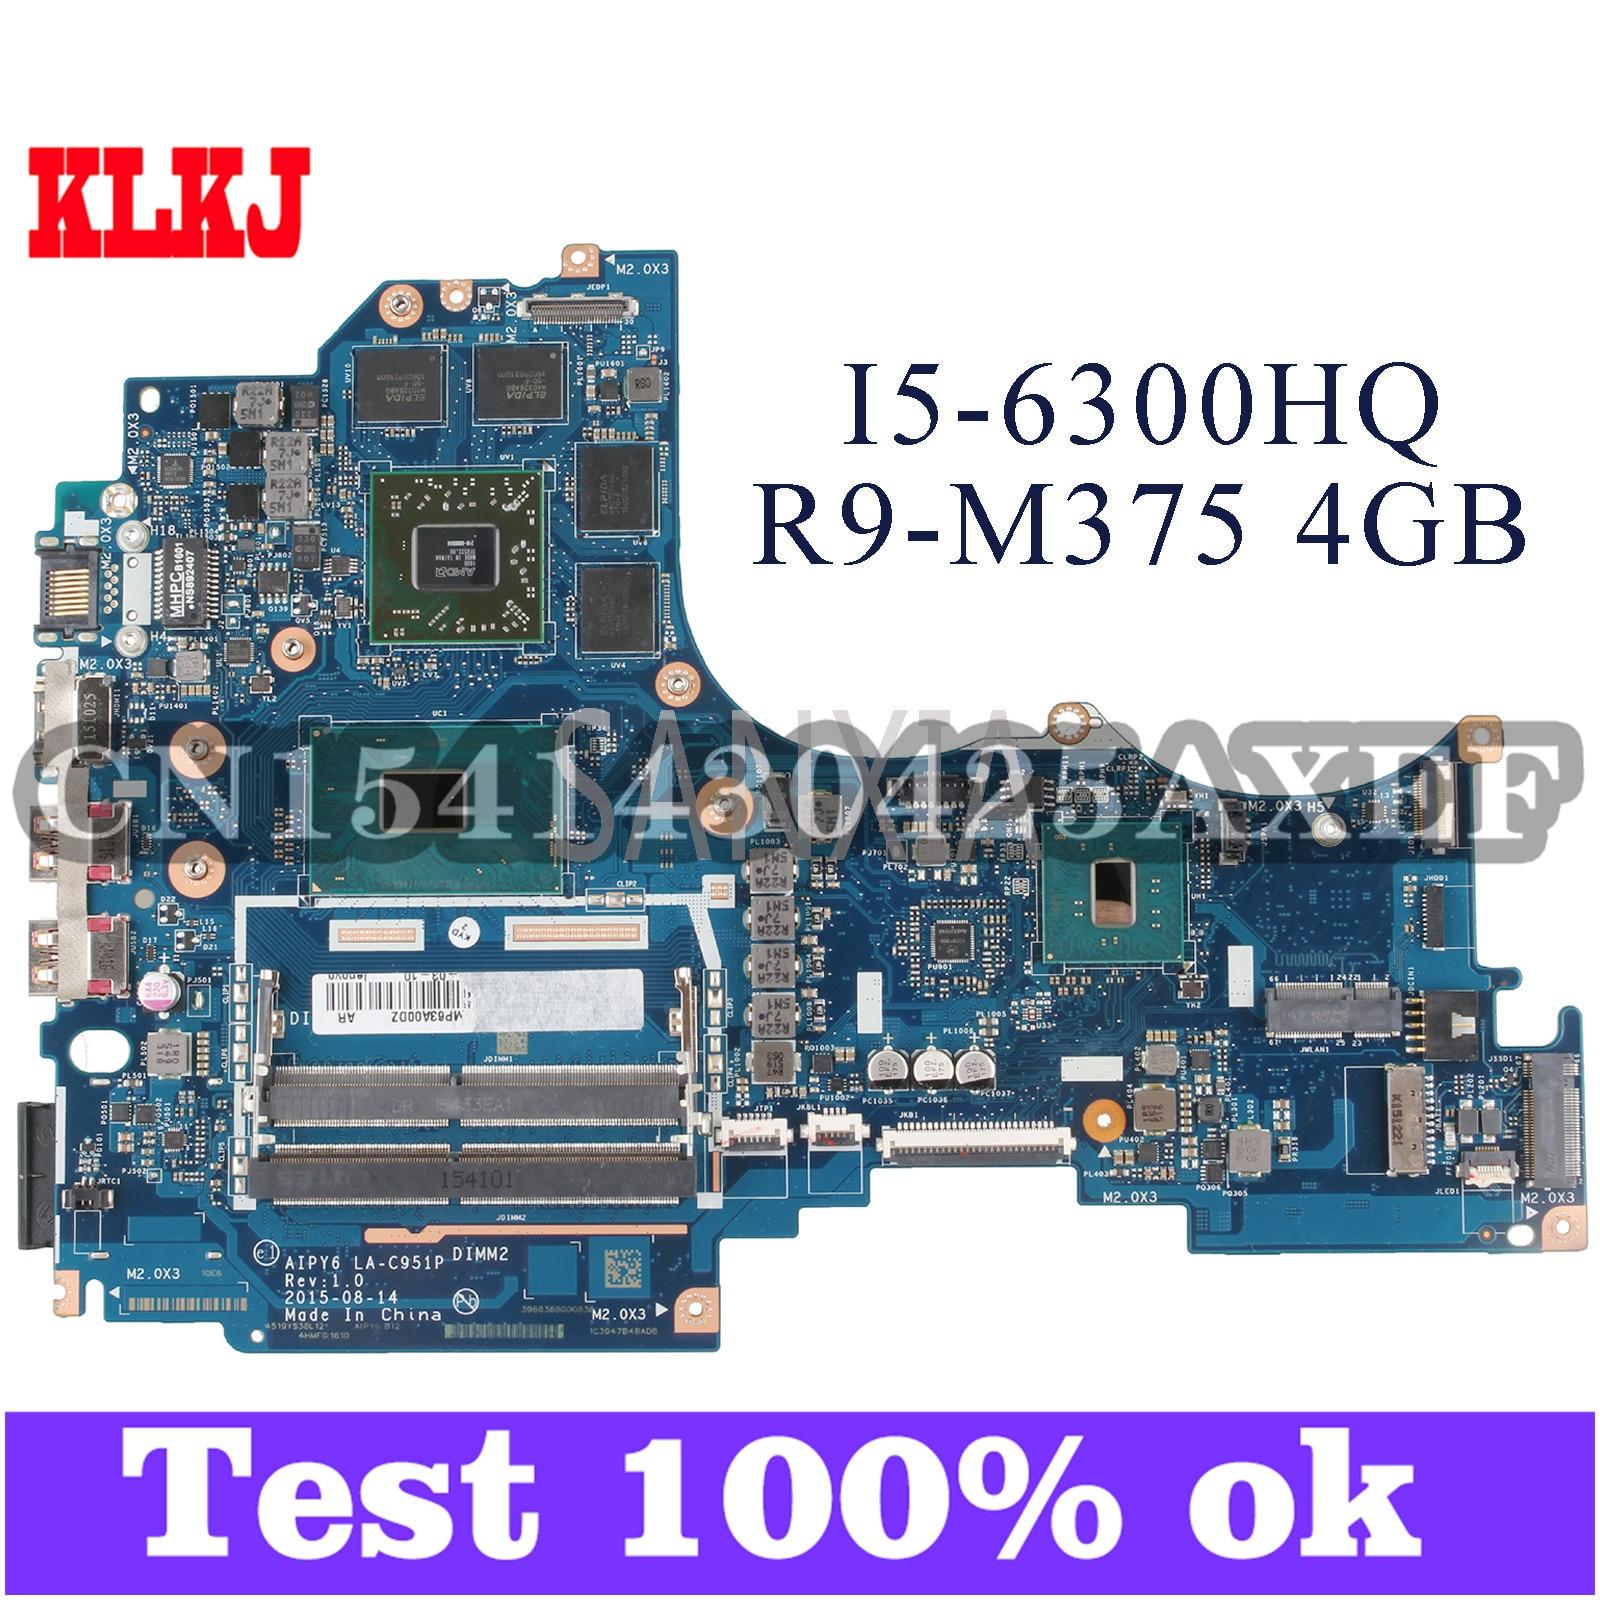 KLKJ AIPY6 LA-C951P اللوحة الأم لأجهزة الكمبيوتر المحمول لينوفو Y700-14ISK اللوحة الرئيسية الأصلية I5-6300HQ R9-M375 4GB